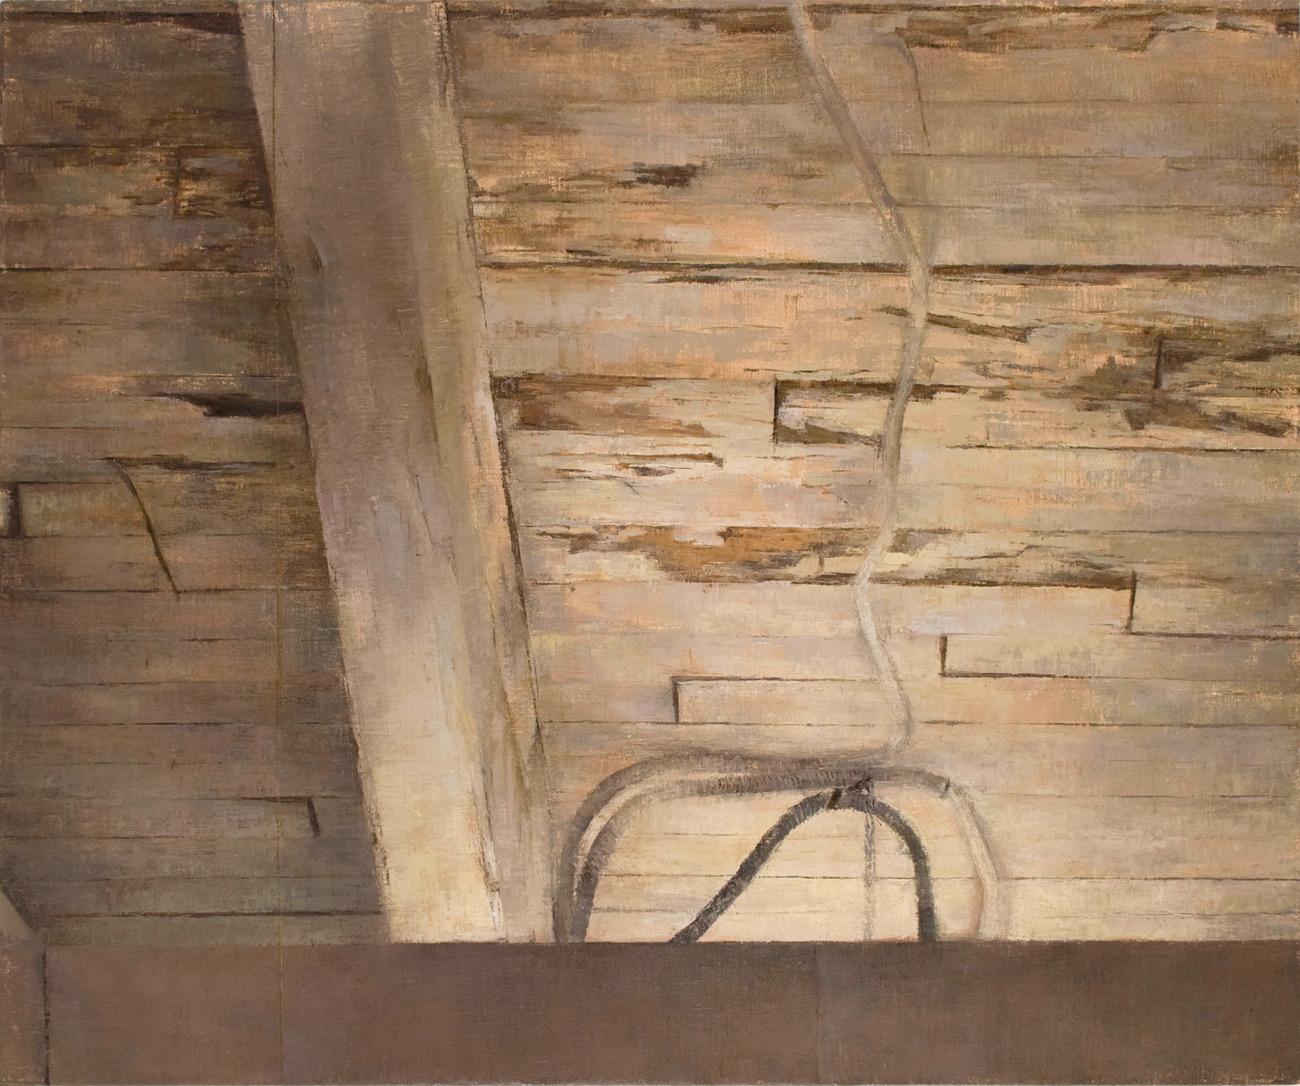 Sean's Ceiling , 2010 oil on linen, 36 x 39in